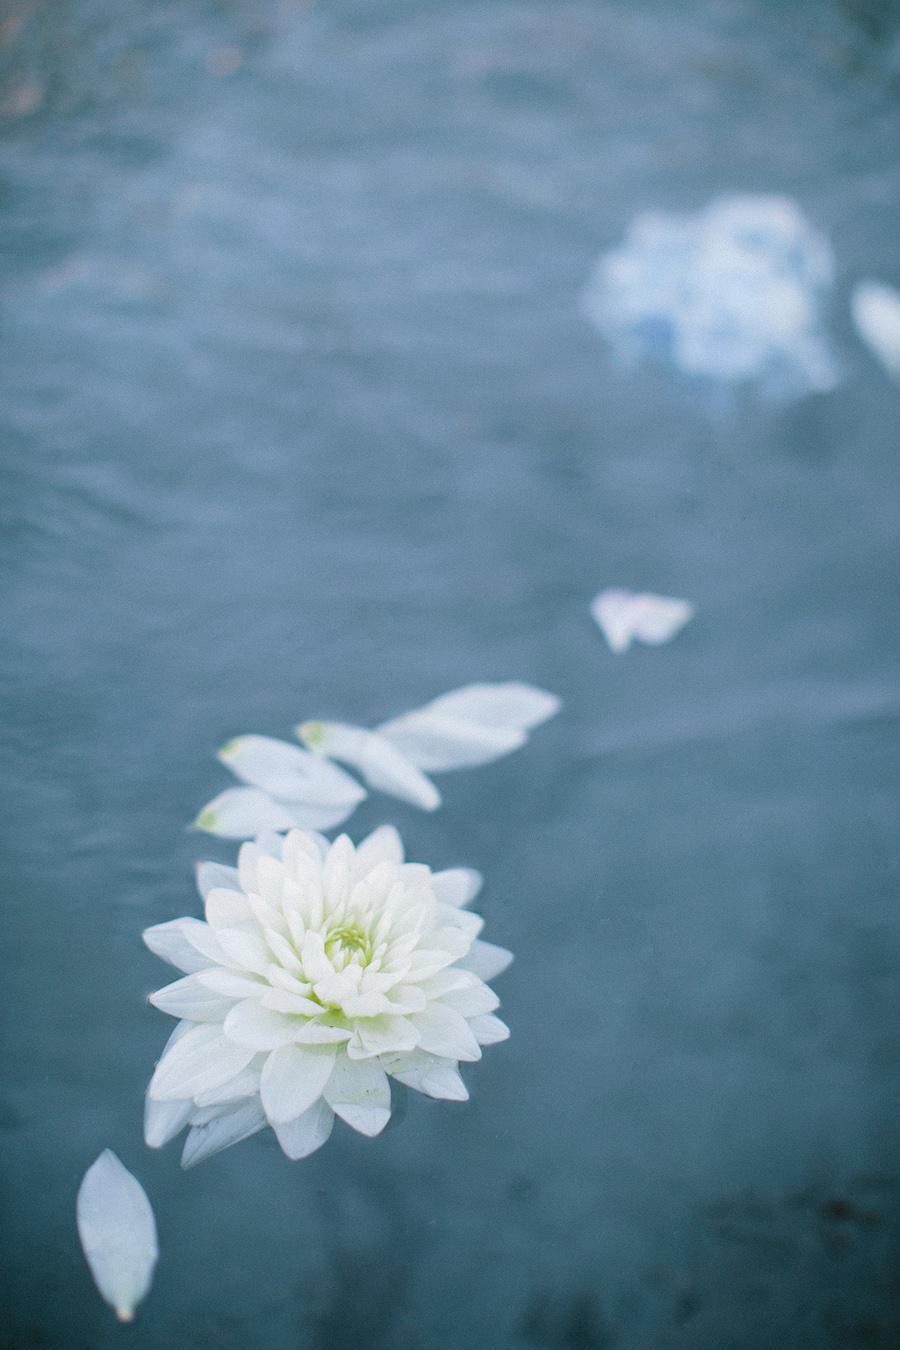 saya-photography-jewish-wedding-provence-rustic-lourmarin-le-galinier-40.jpg